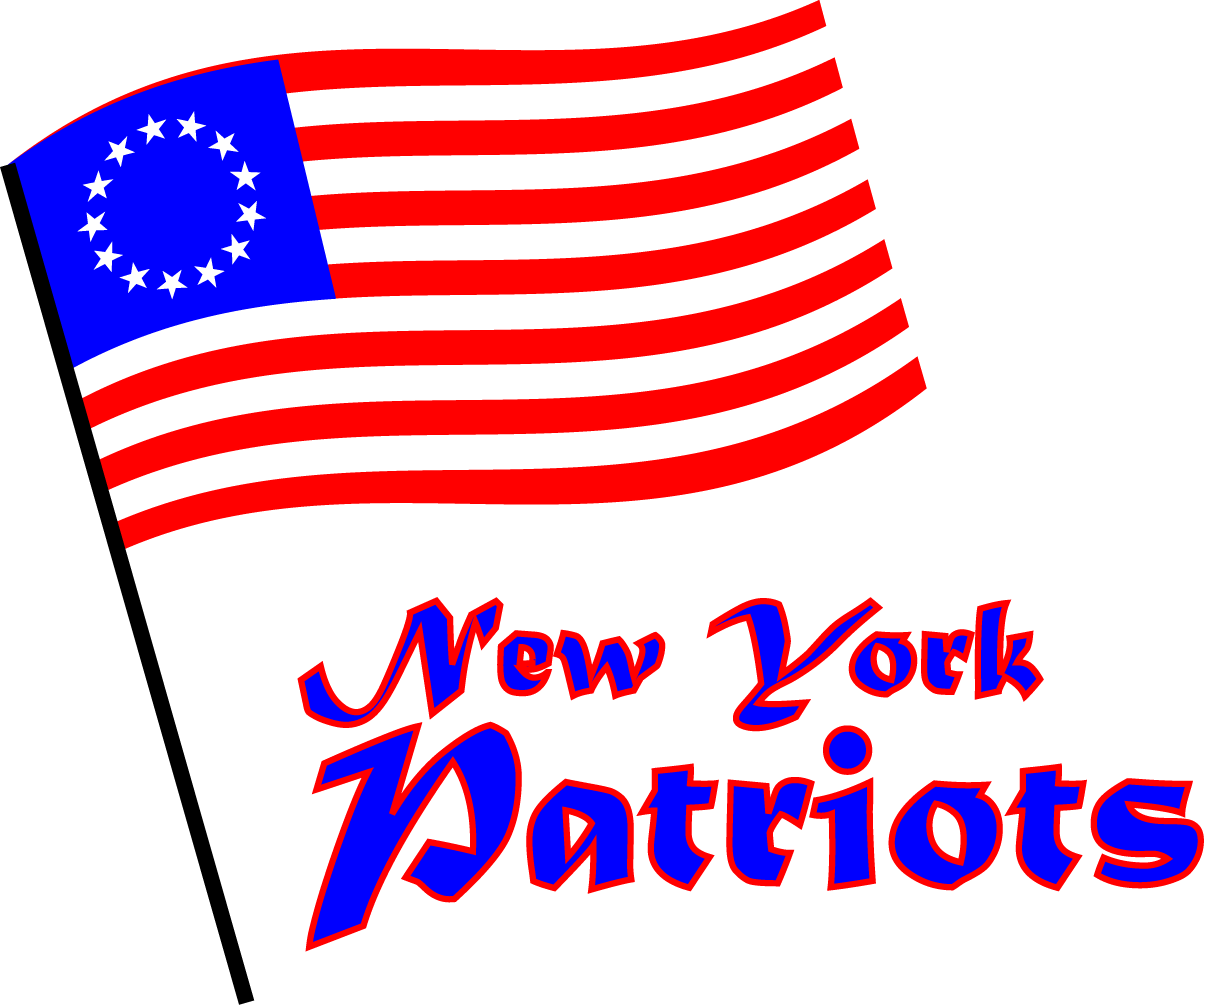 American basketball patriots logo png #2164 - Free ...